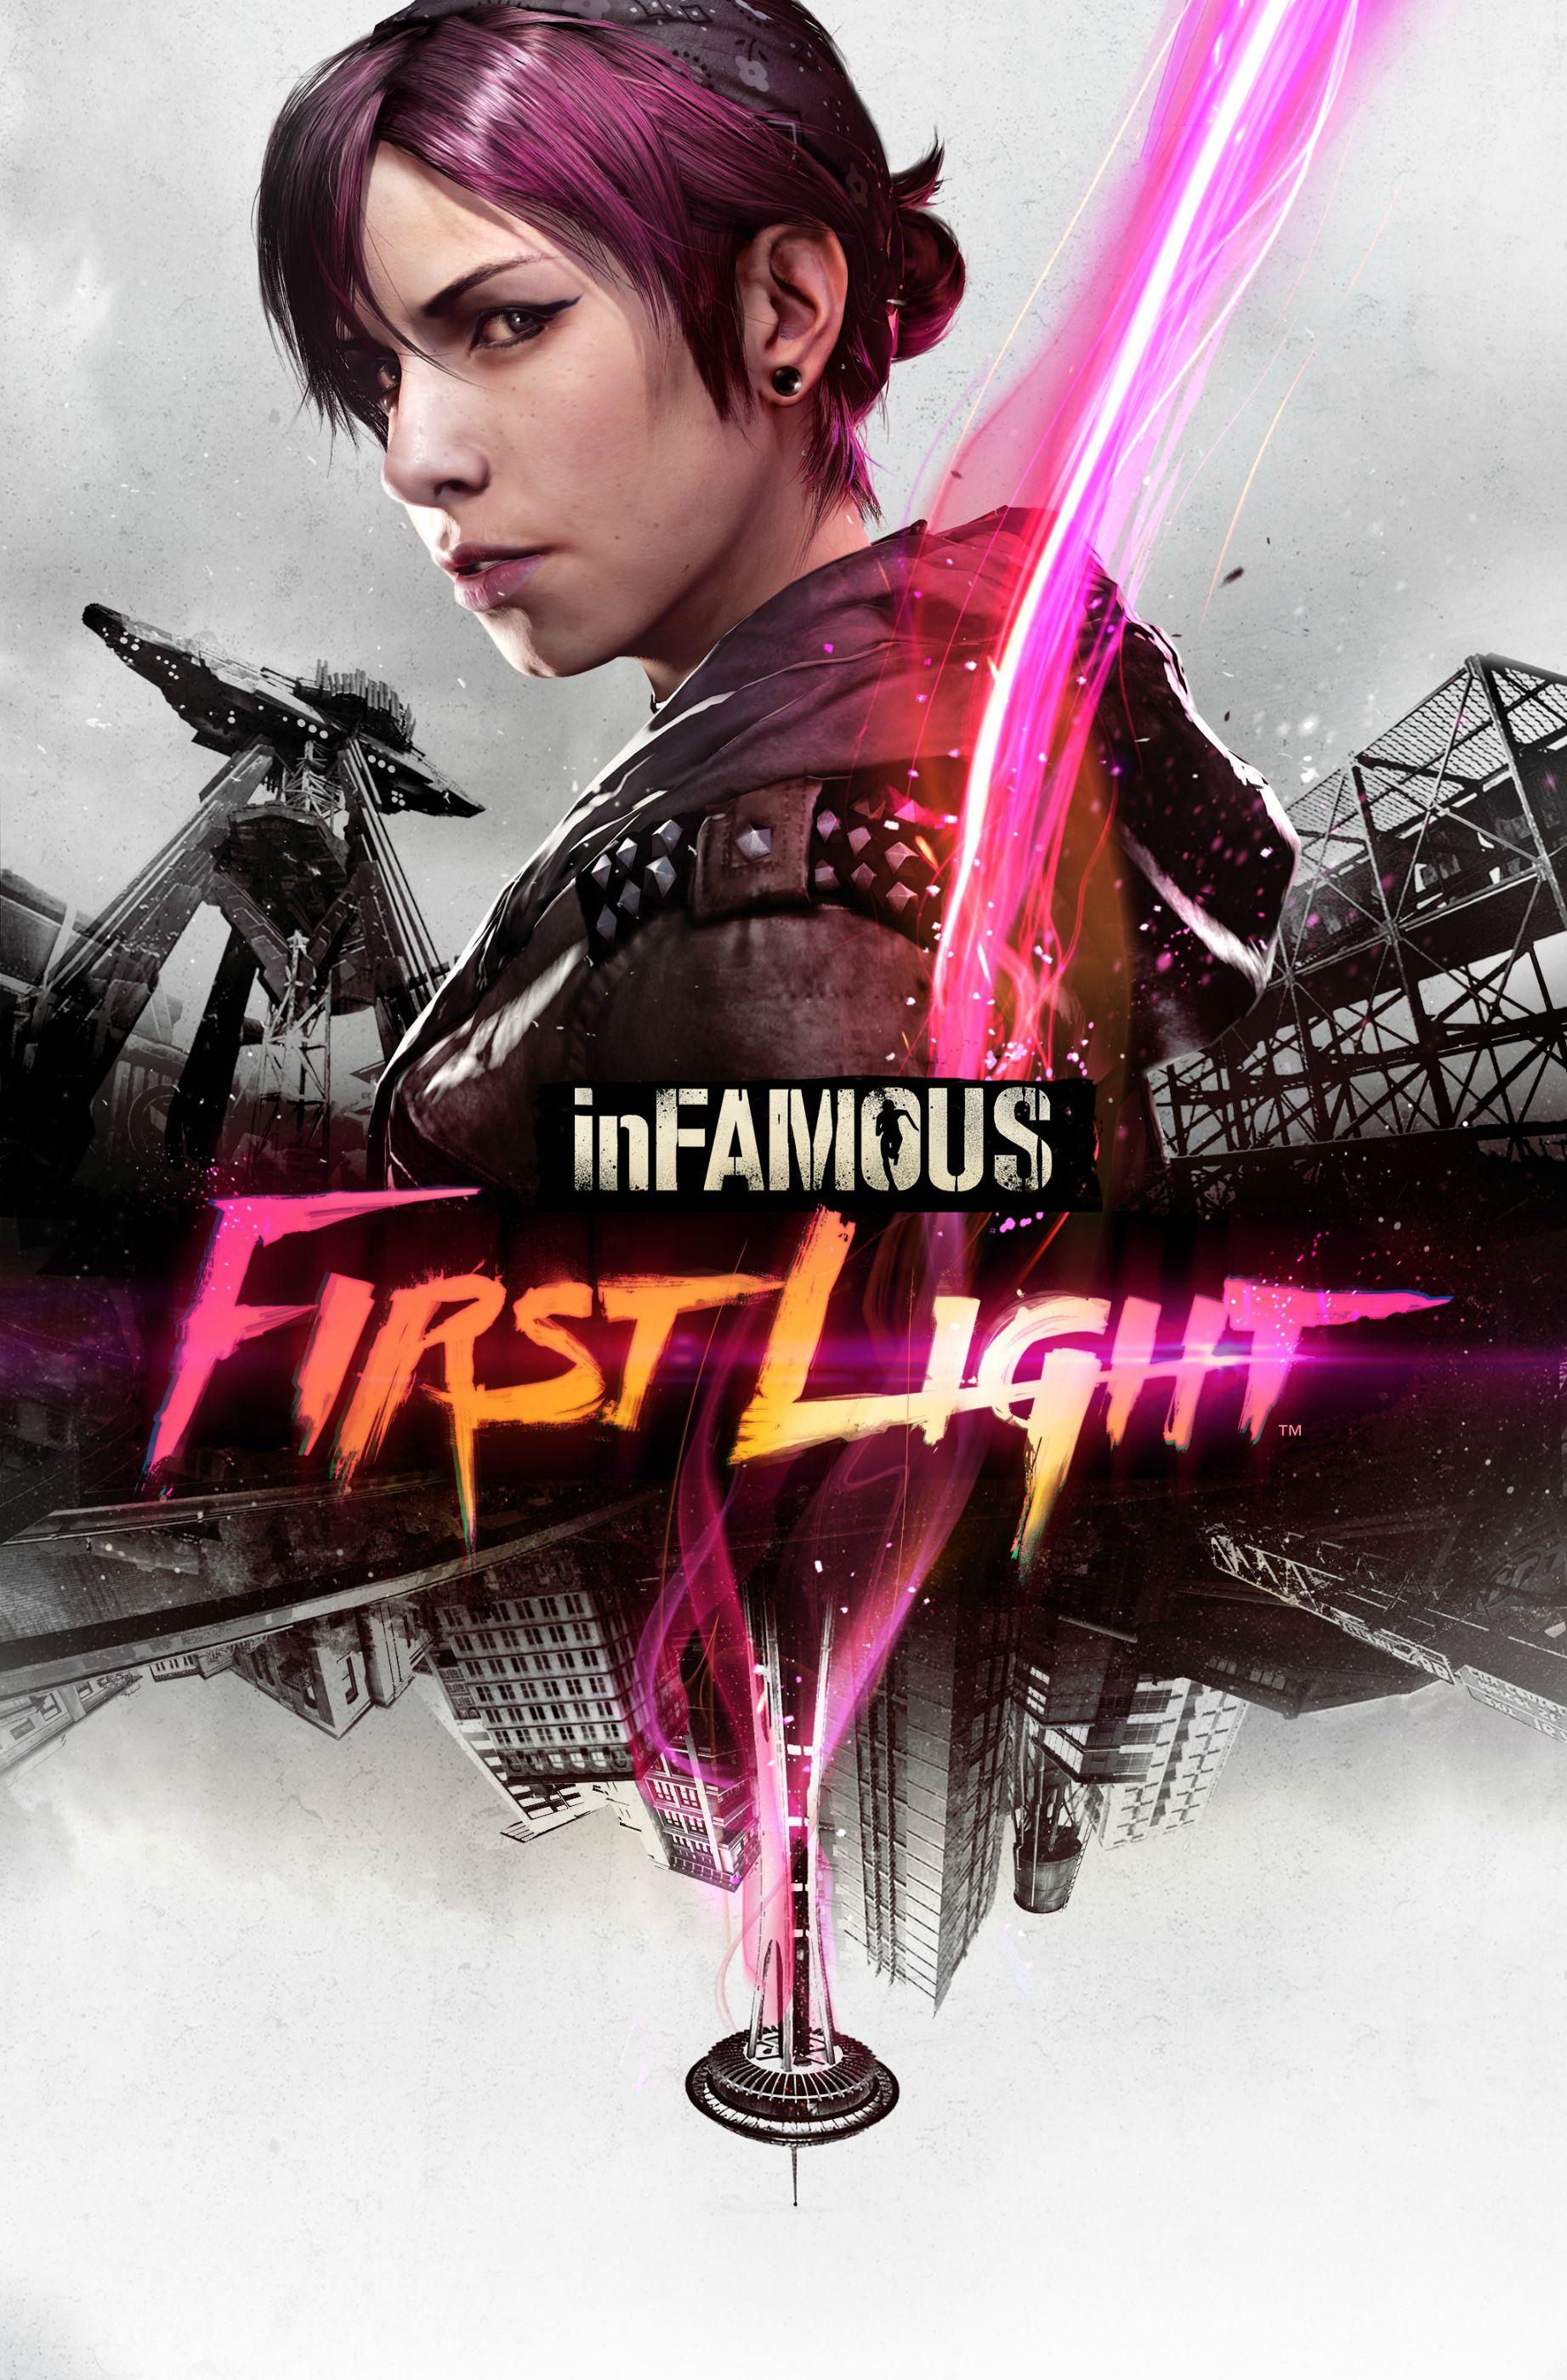 High Resolution Wallpaper | InFAMOUS: First Light 1843x2799 px